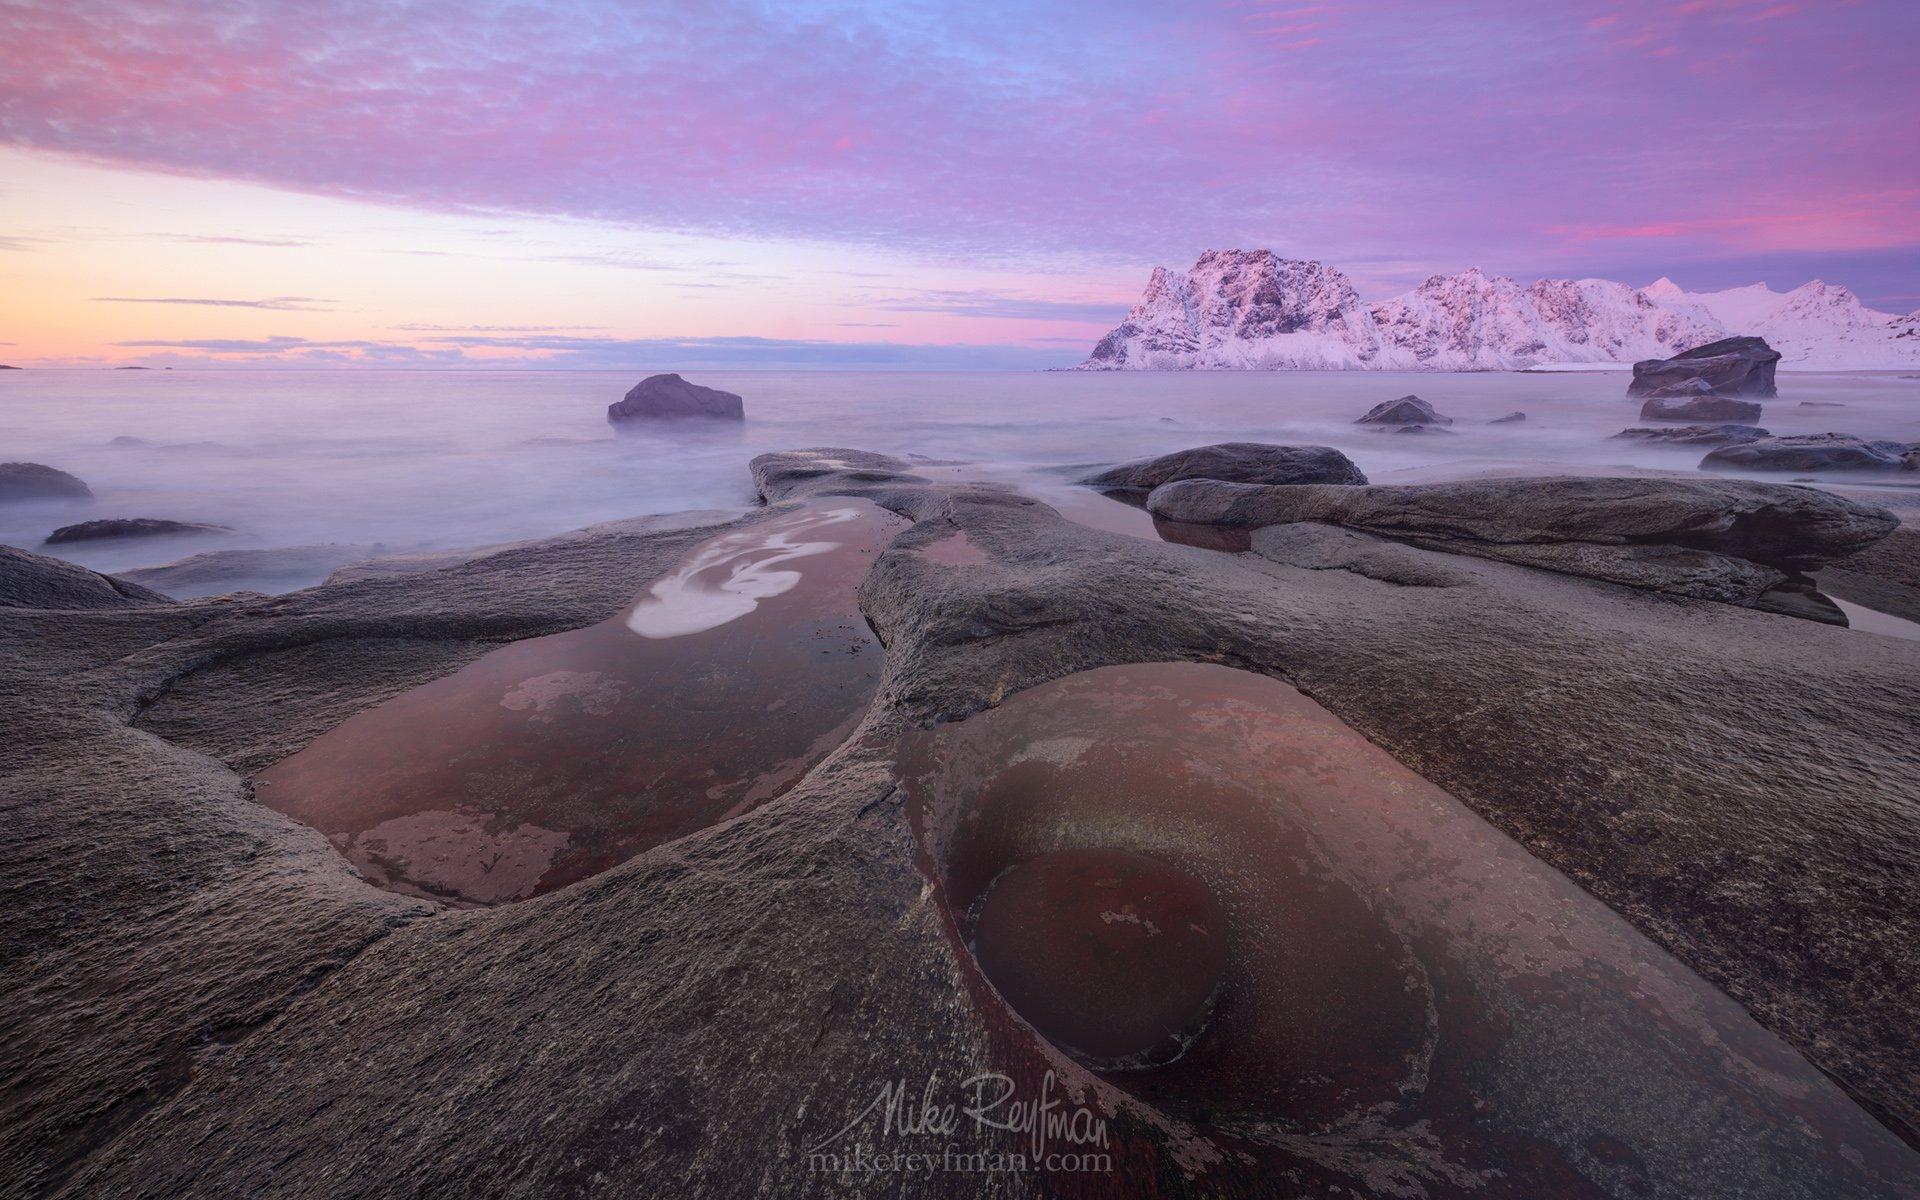 arctic avocado, winter sunset, uttakleiv beach, uttakleiv eye, lofoten, norway., Майк Рейфман